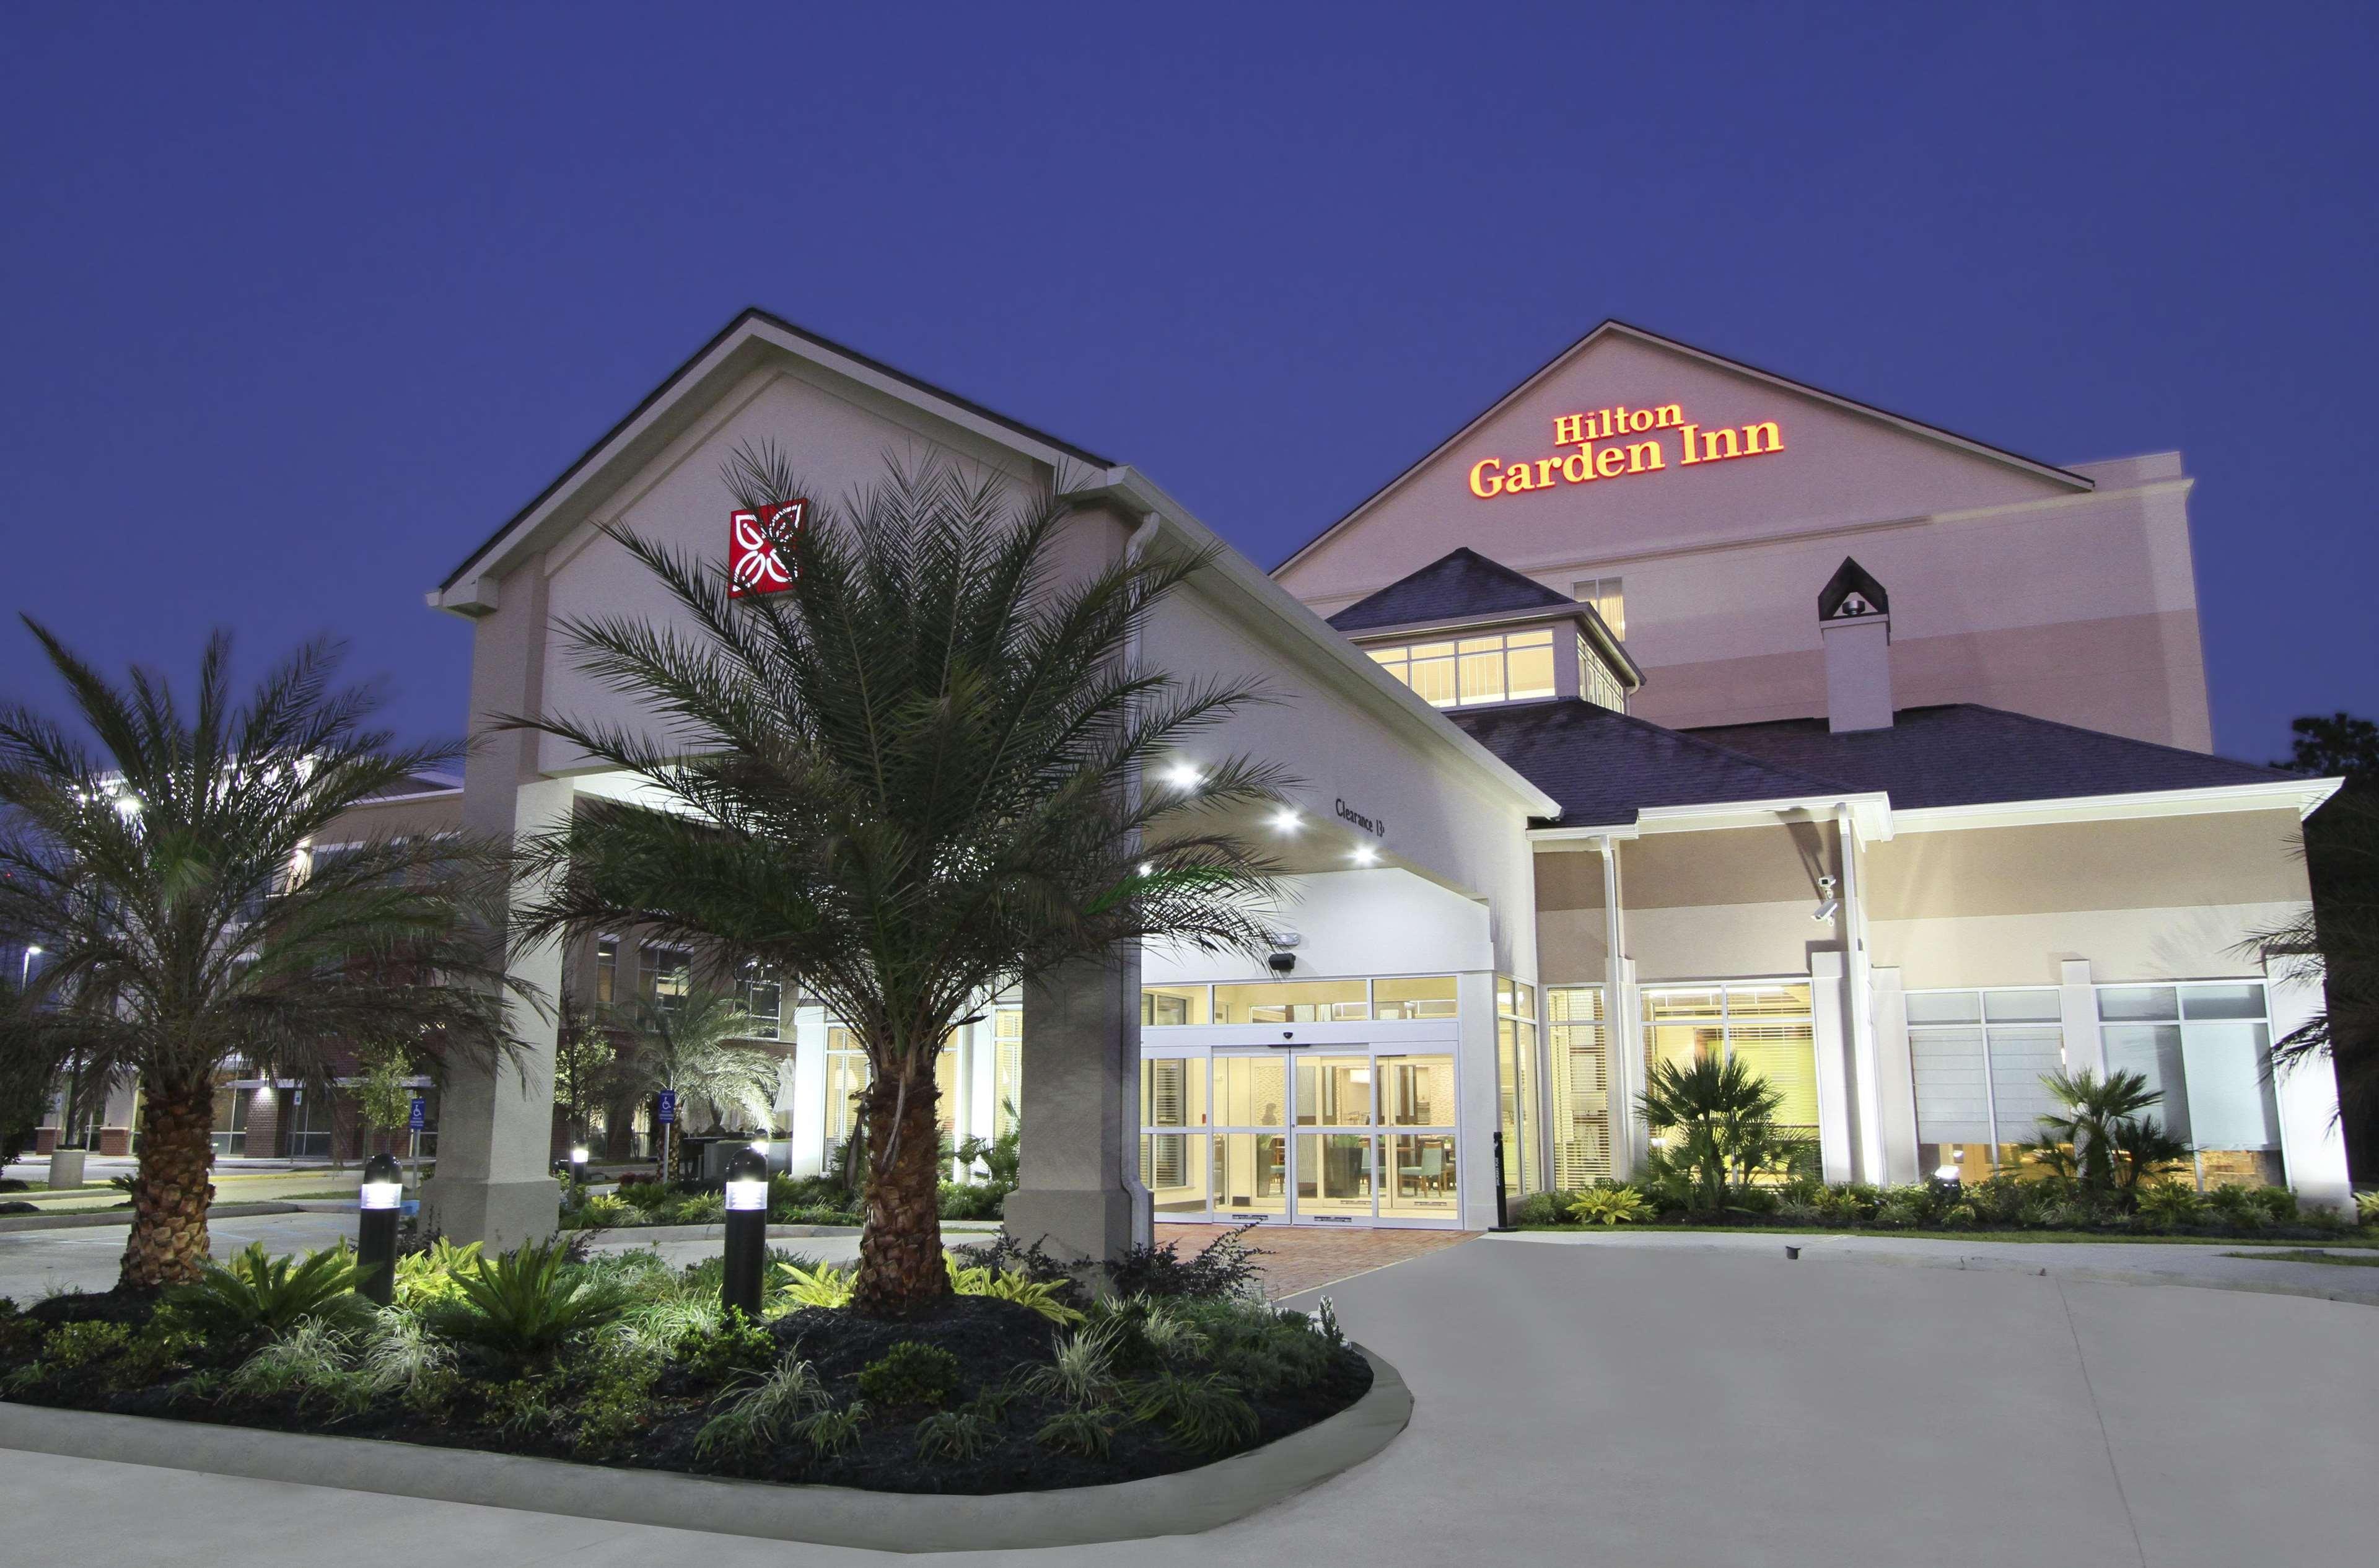 Hilton Garden Inn Covington/Mandeville, Saint Tammany